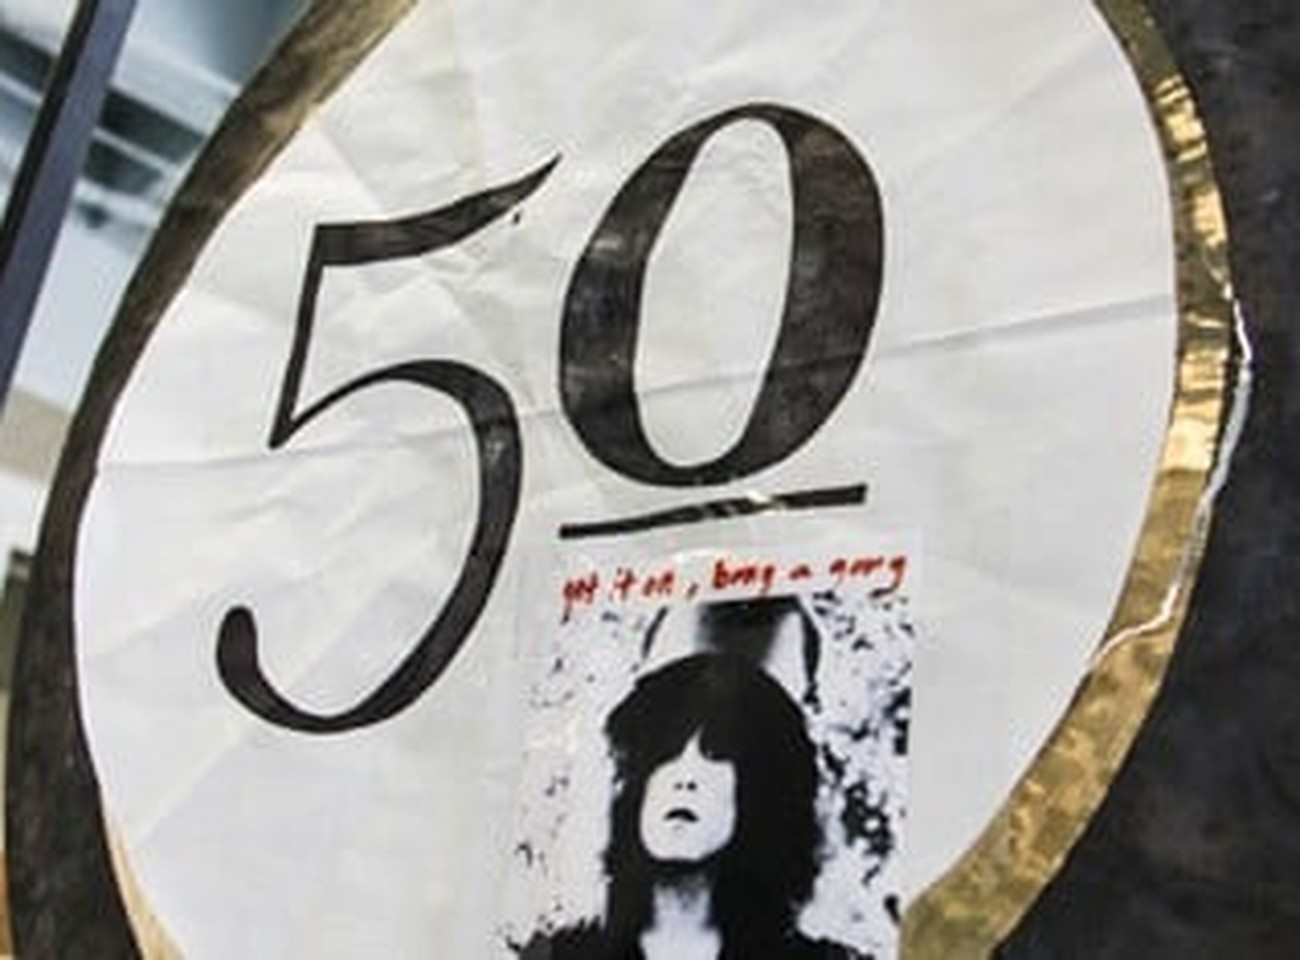 World 50 Careers